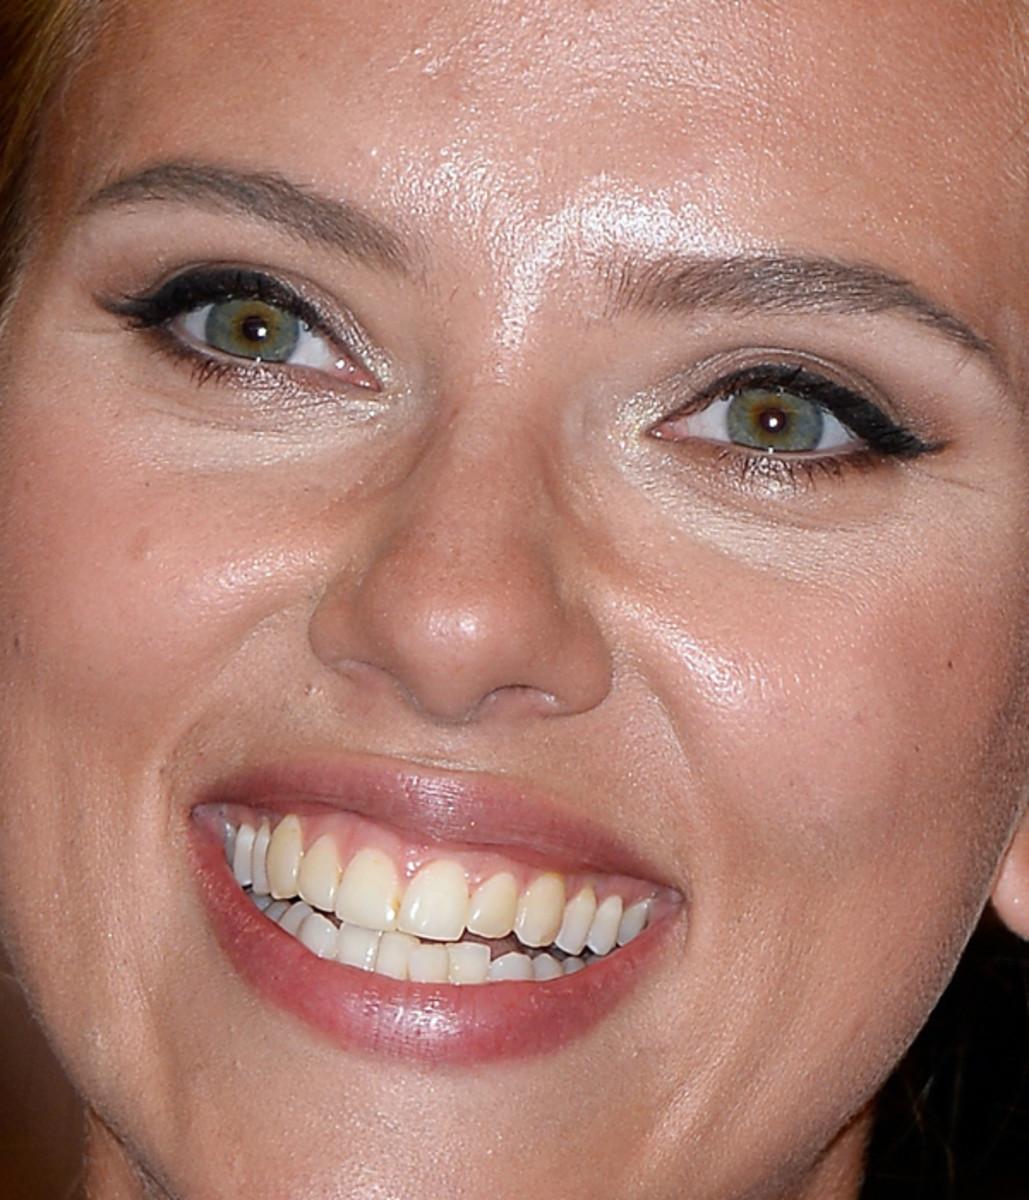 Scarlett Johansson makeup - winged liner